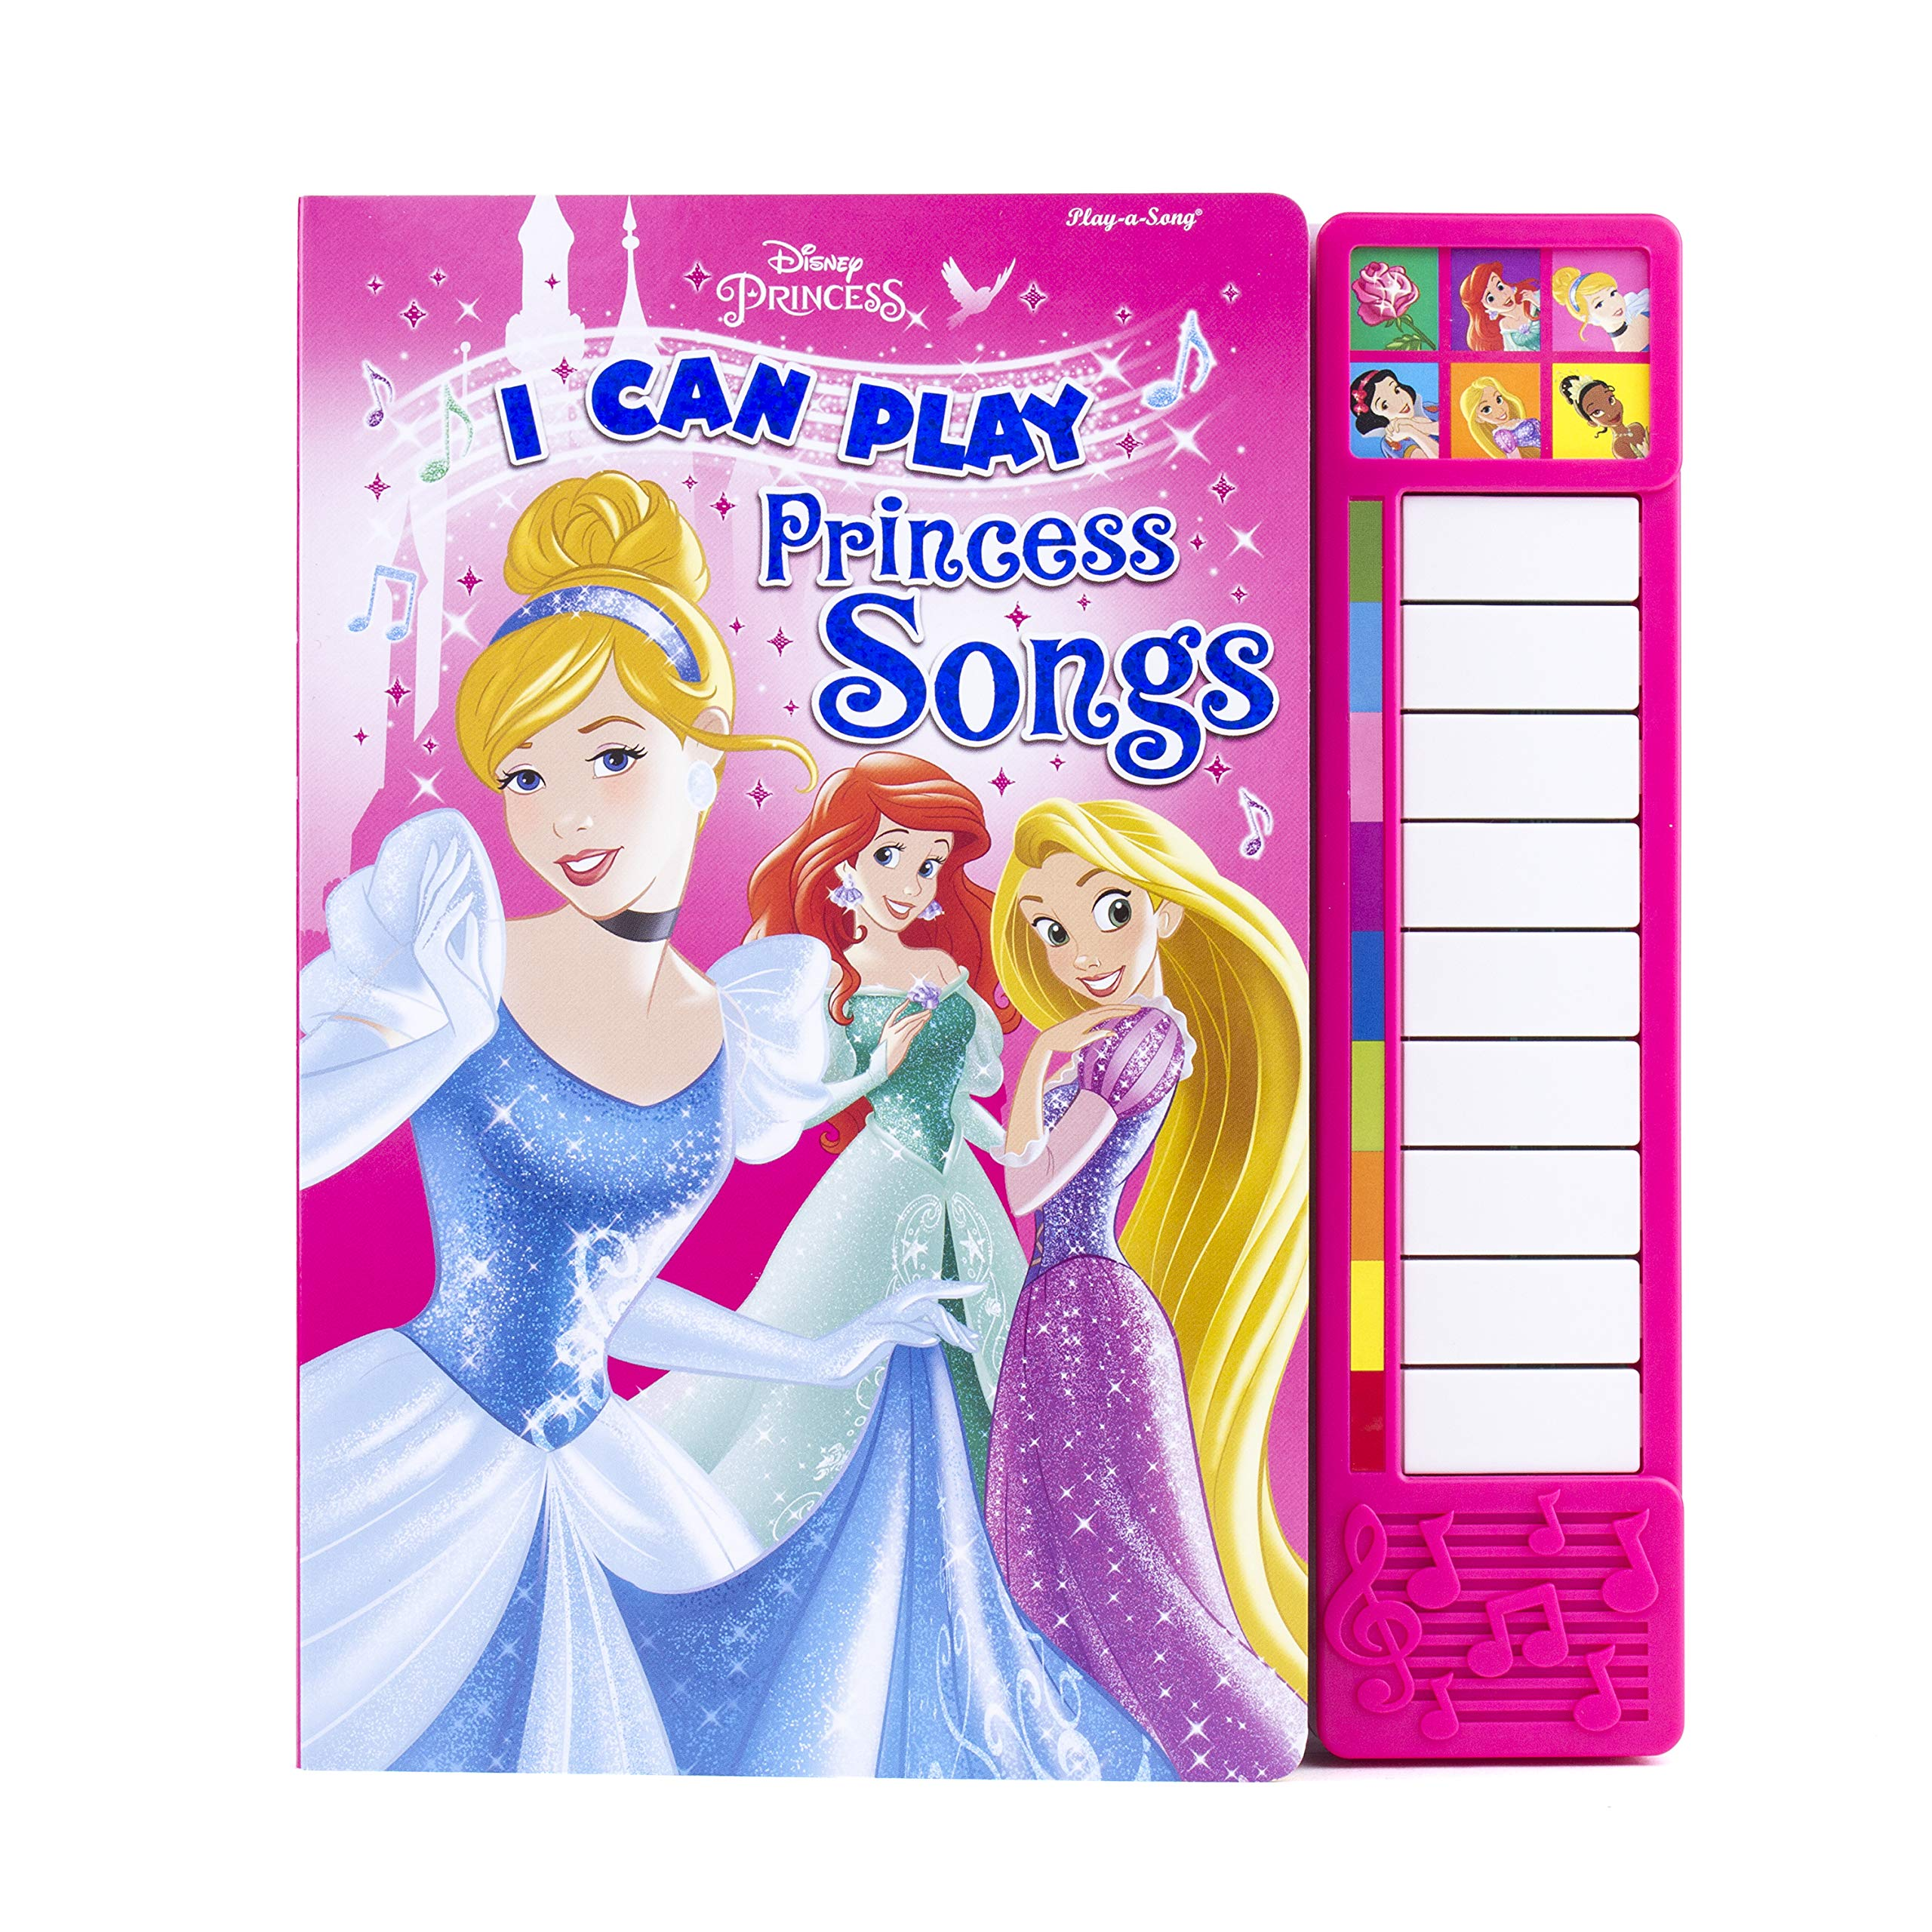 Disney THE PRINCESSES Craft Buttons 1ST CLASS PP Ariel Cinderella Belle Rapunzel